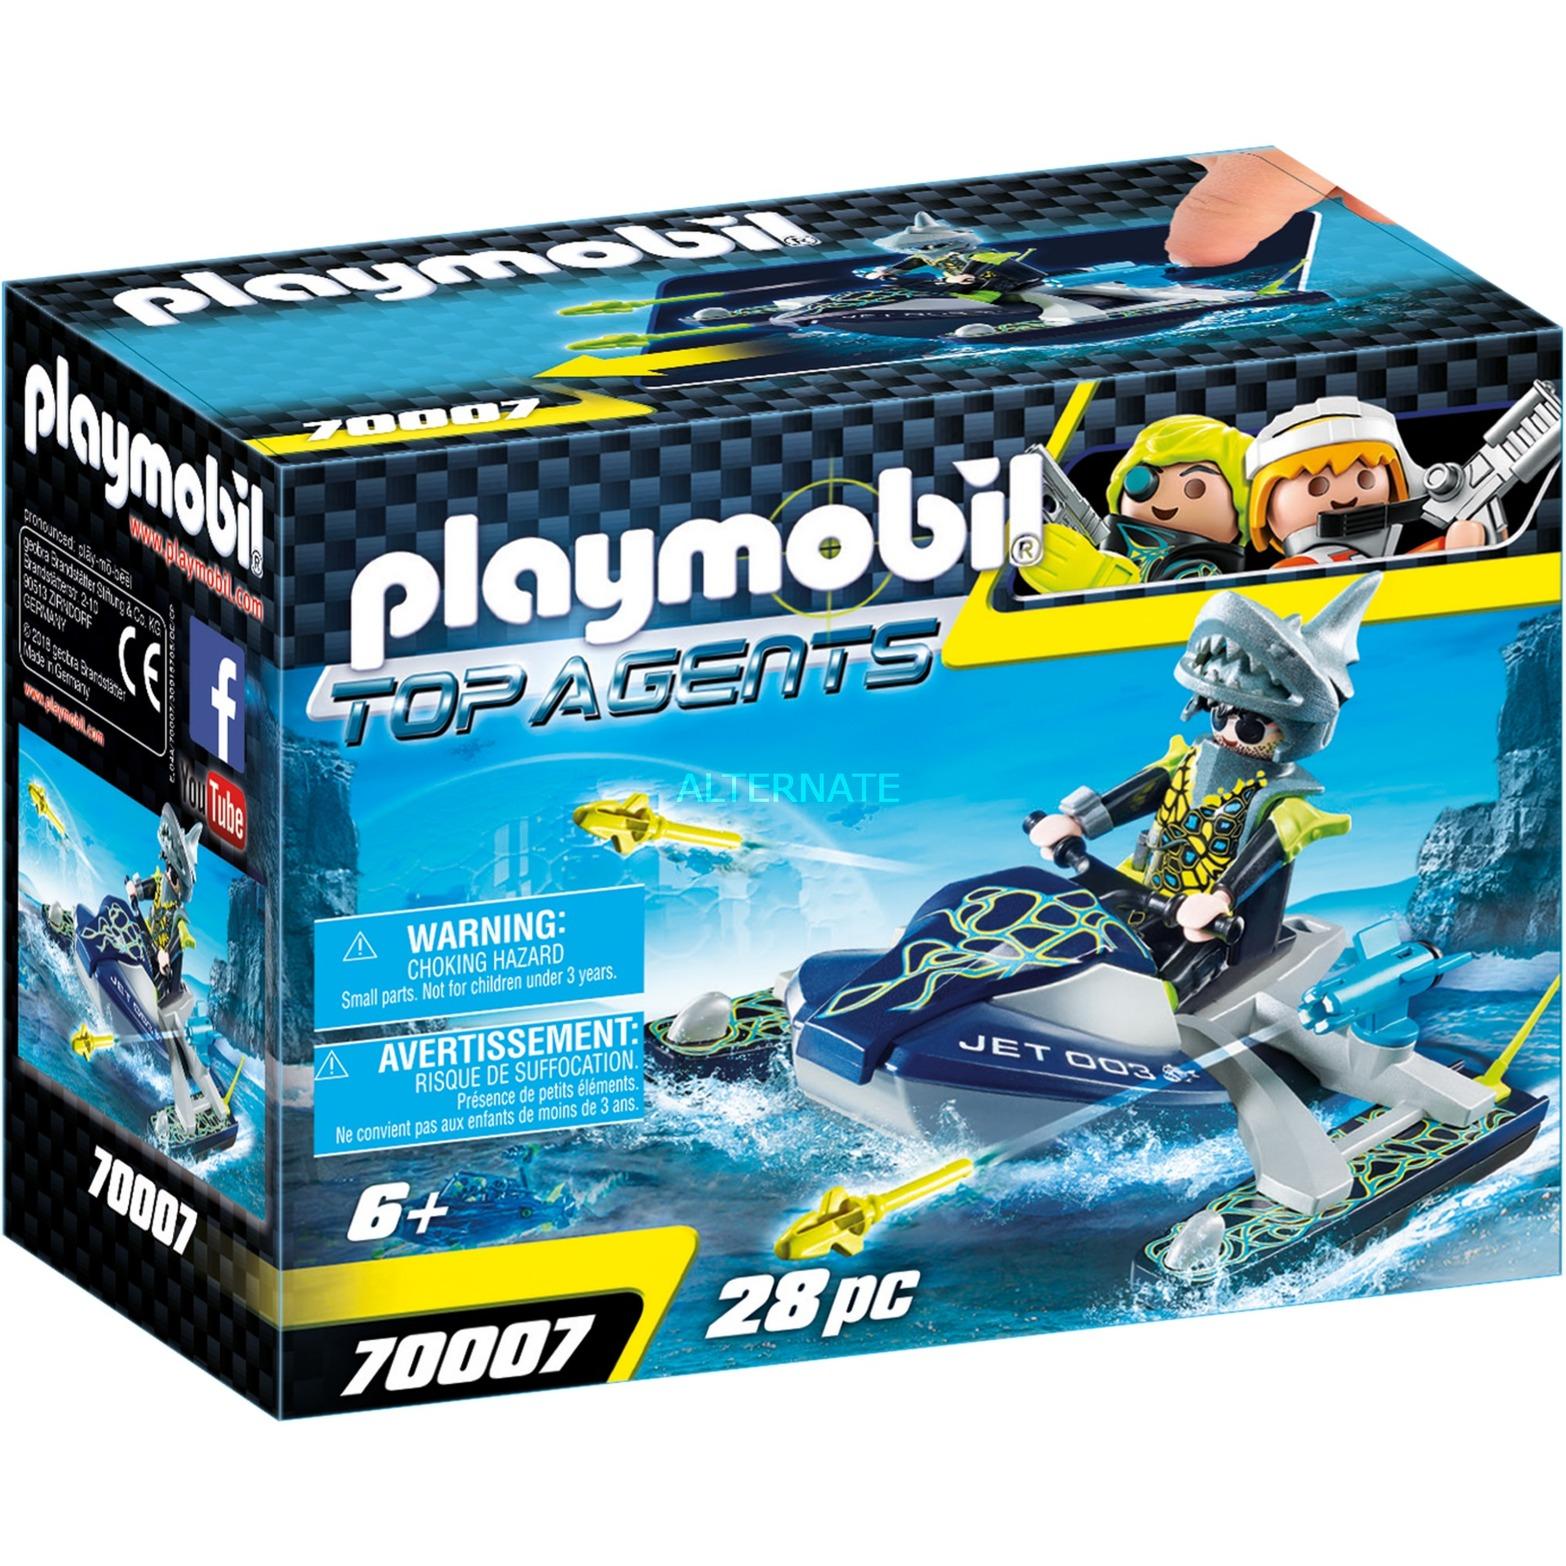 Populære PLAYMOBIL Top Agents TEAM S.H.A.R.K. Rocket Rafter, Bygge legetøj WW-92